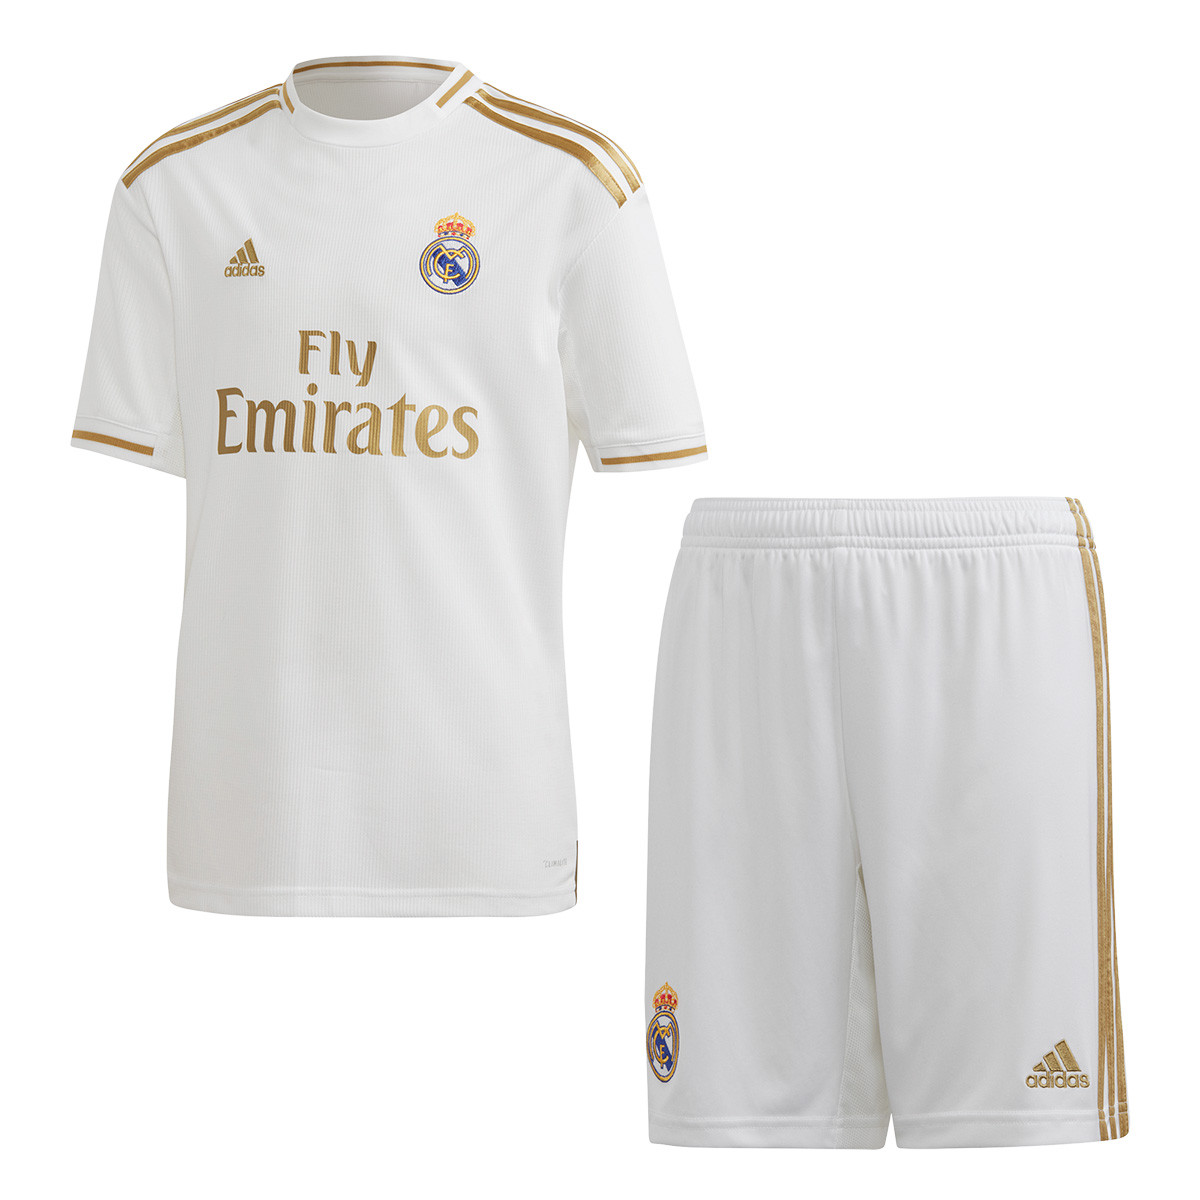 new products b9d30 f6457 Conjunto Real Madrid Primera Equipación 2019-2020 Niño White